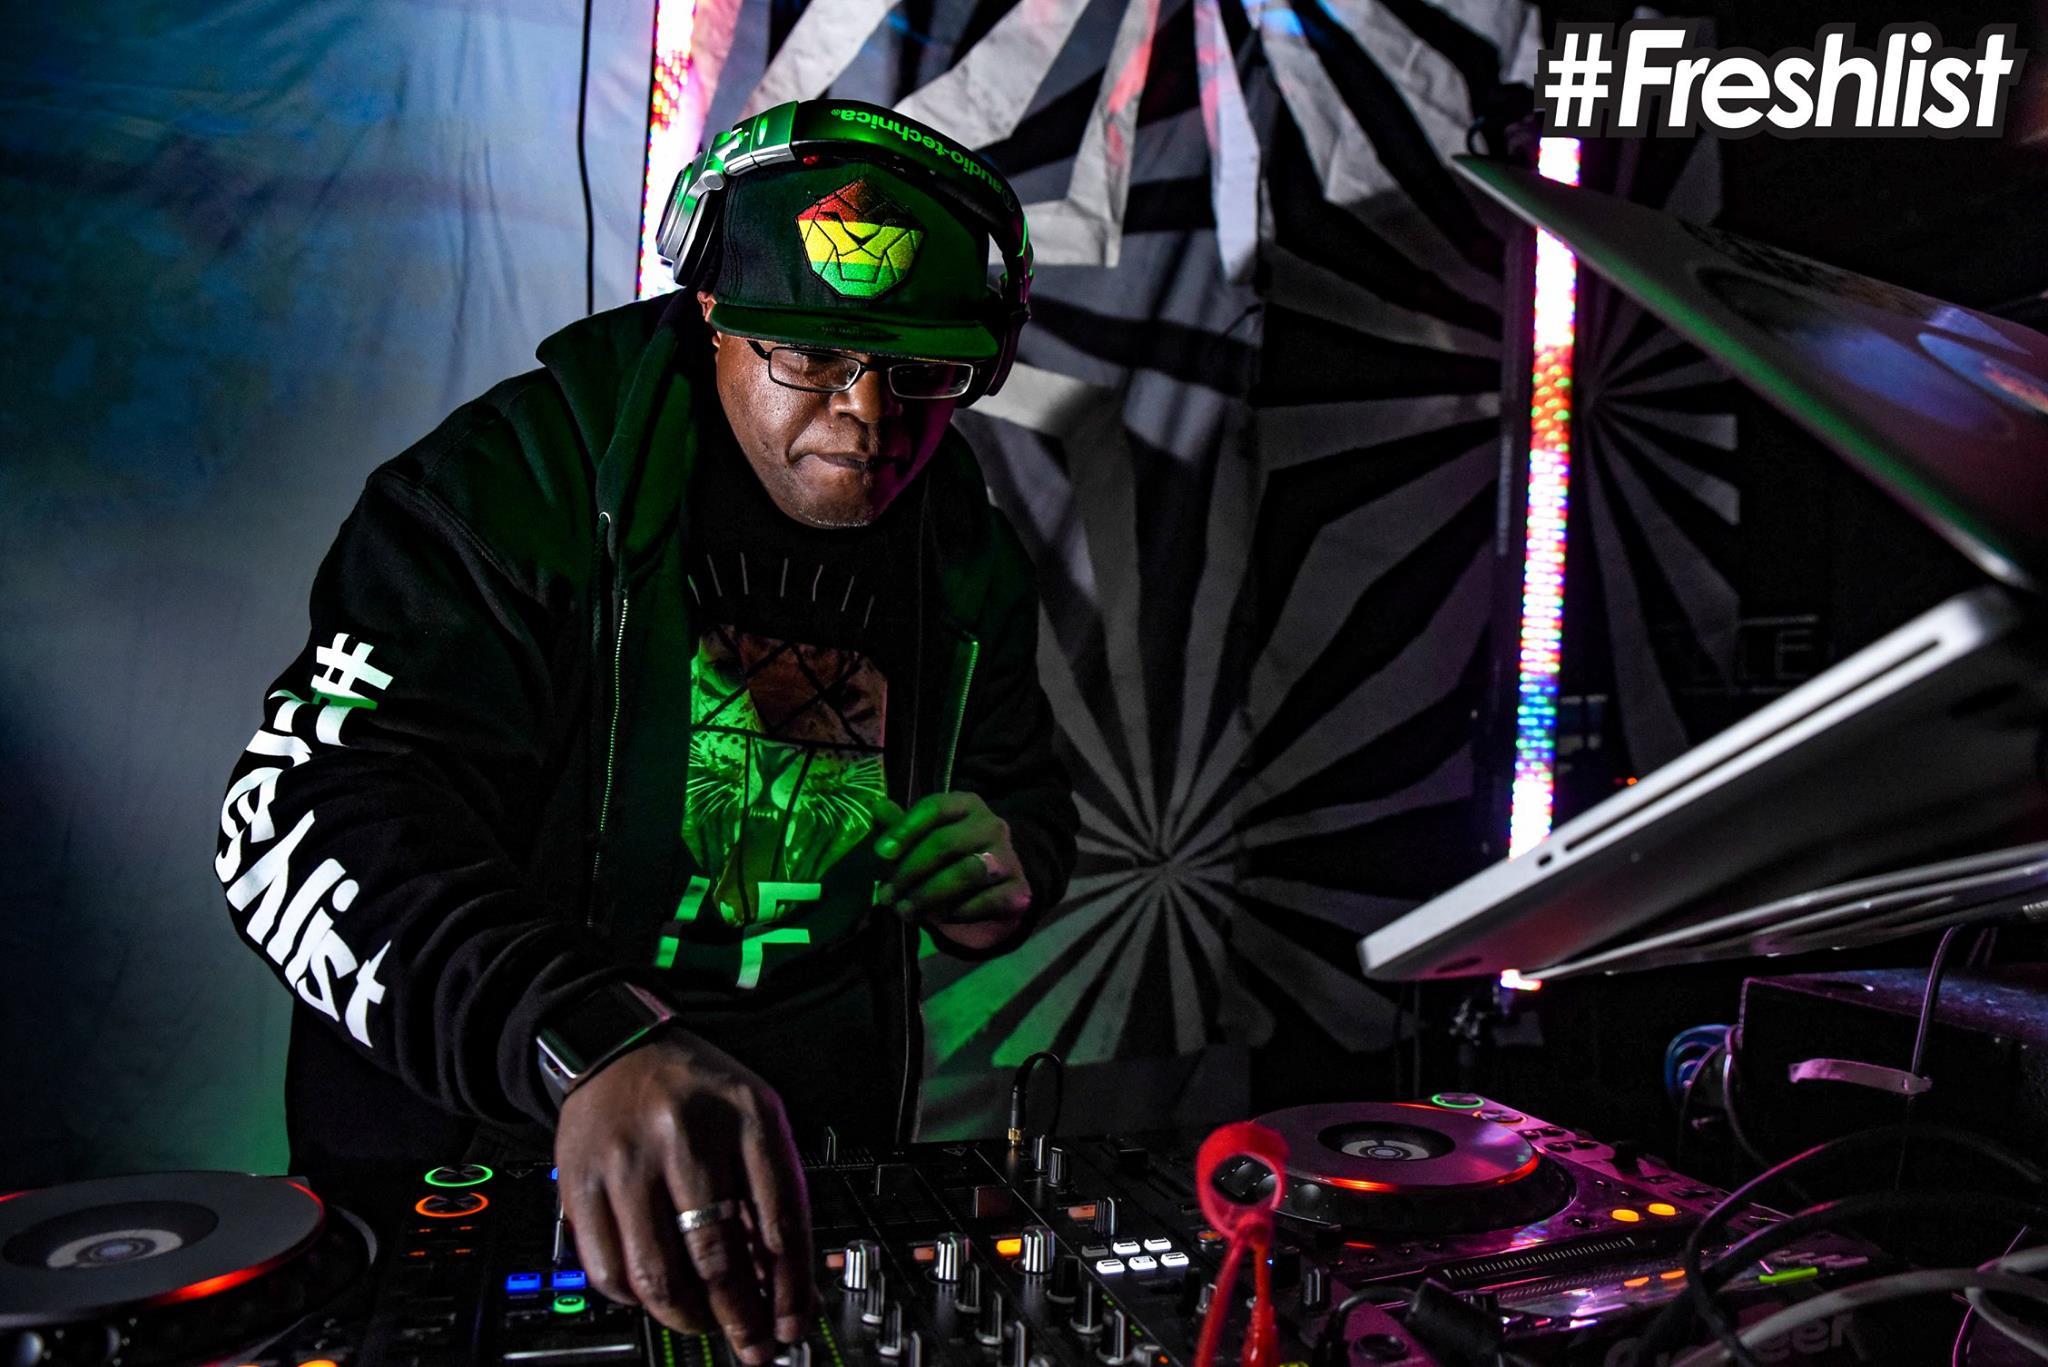 Firecat 451 - Live at the #Freshlist